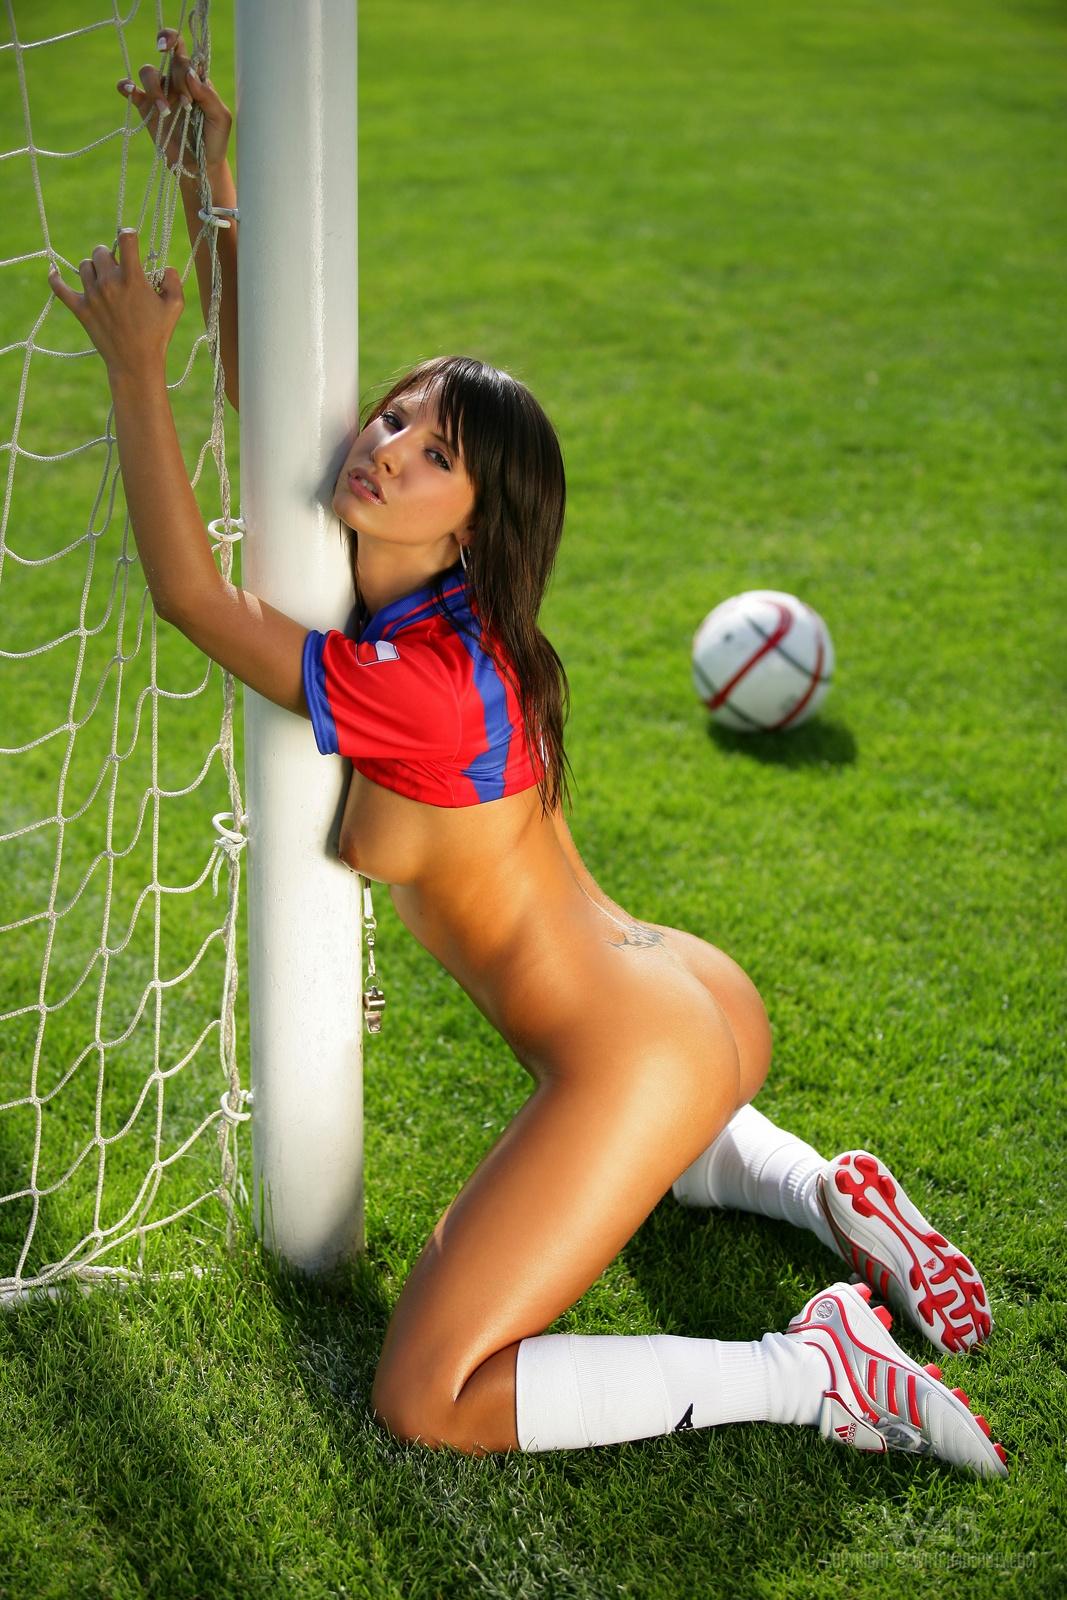 monika-vesela-nude-football-watch4beauty-27